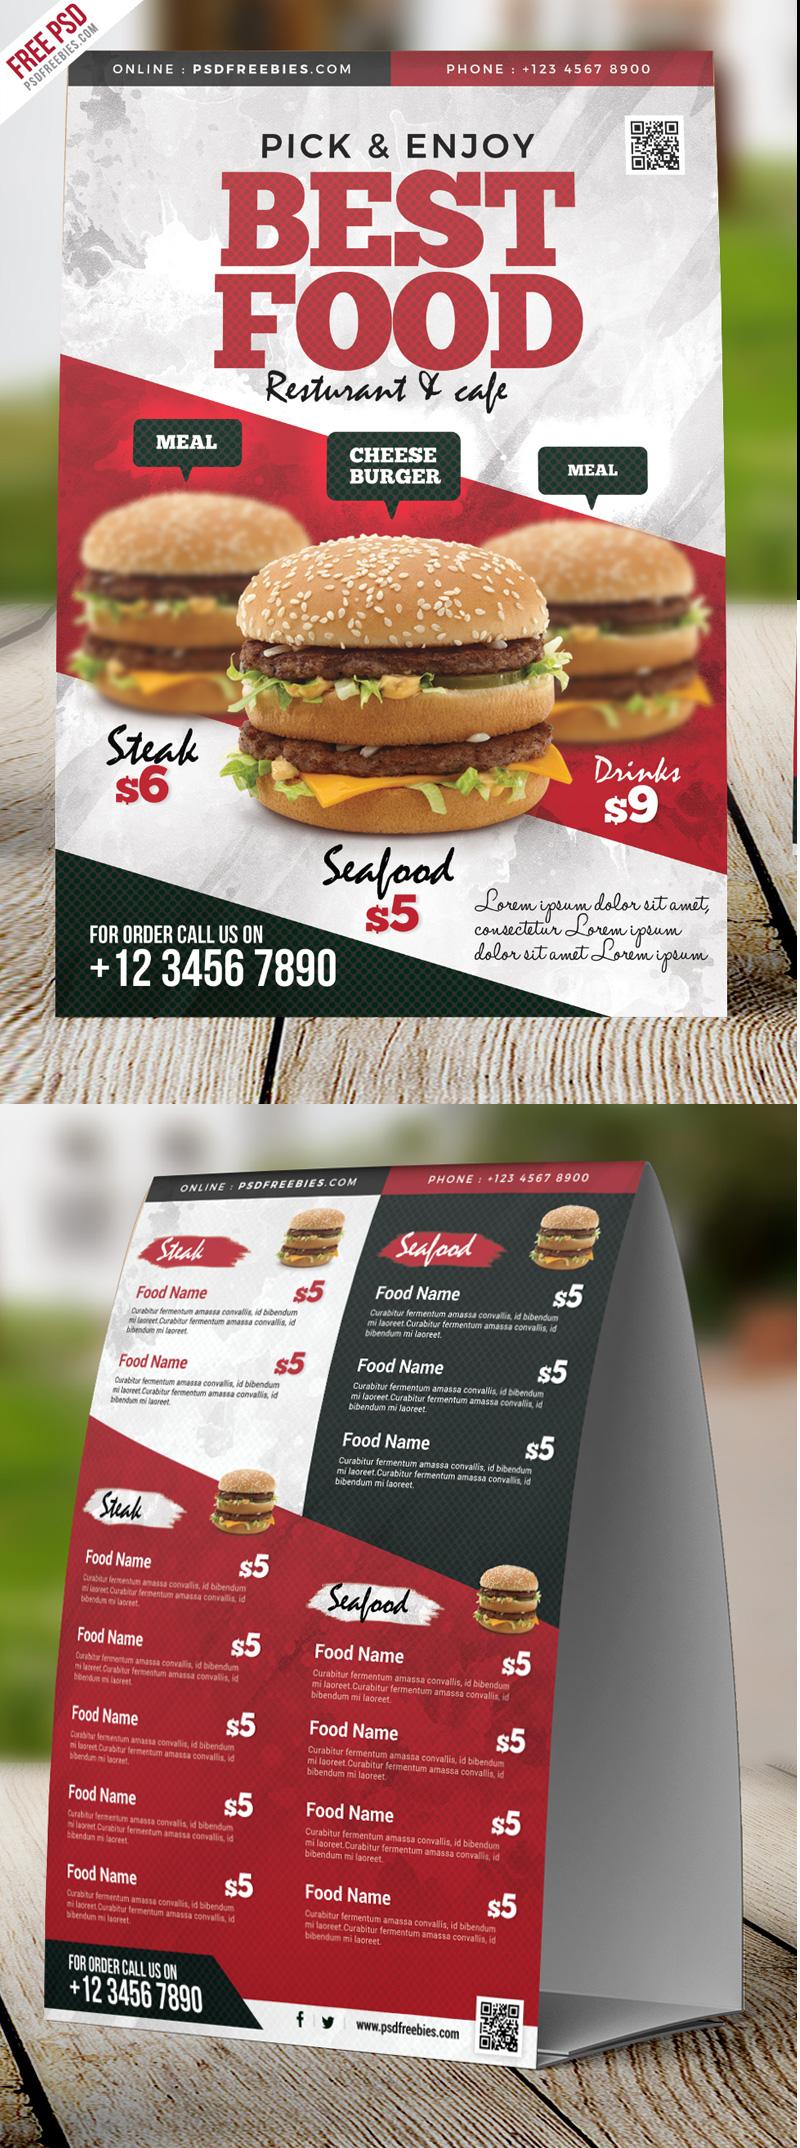 restaurant food menu table tent card psd psdfreebies com